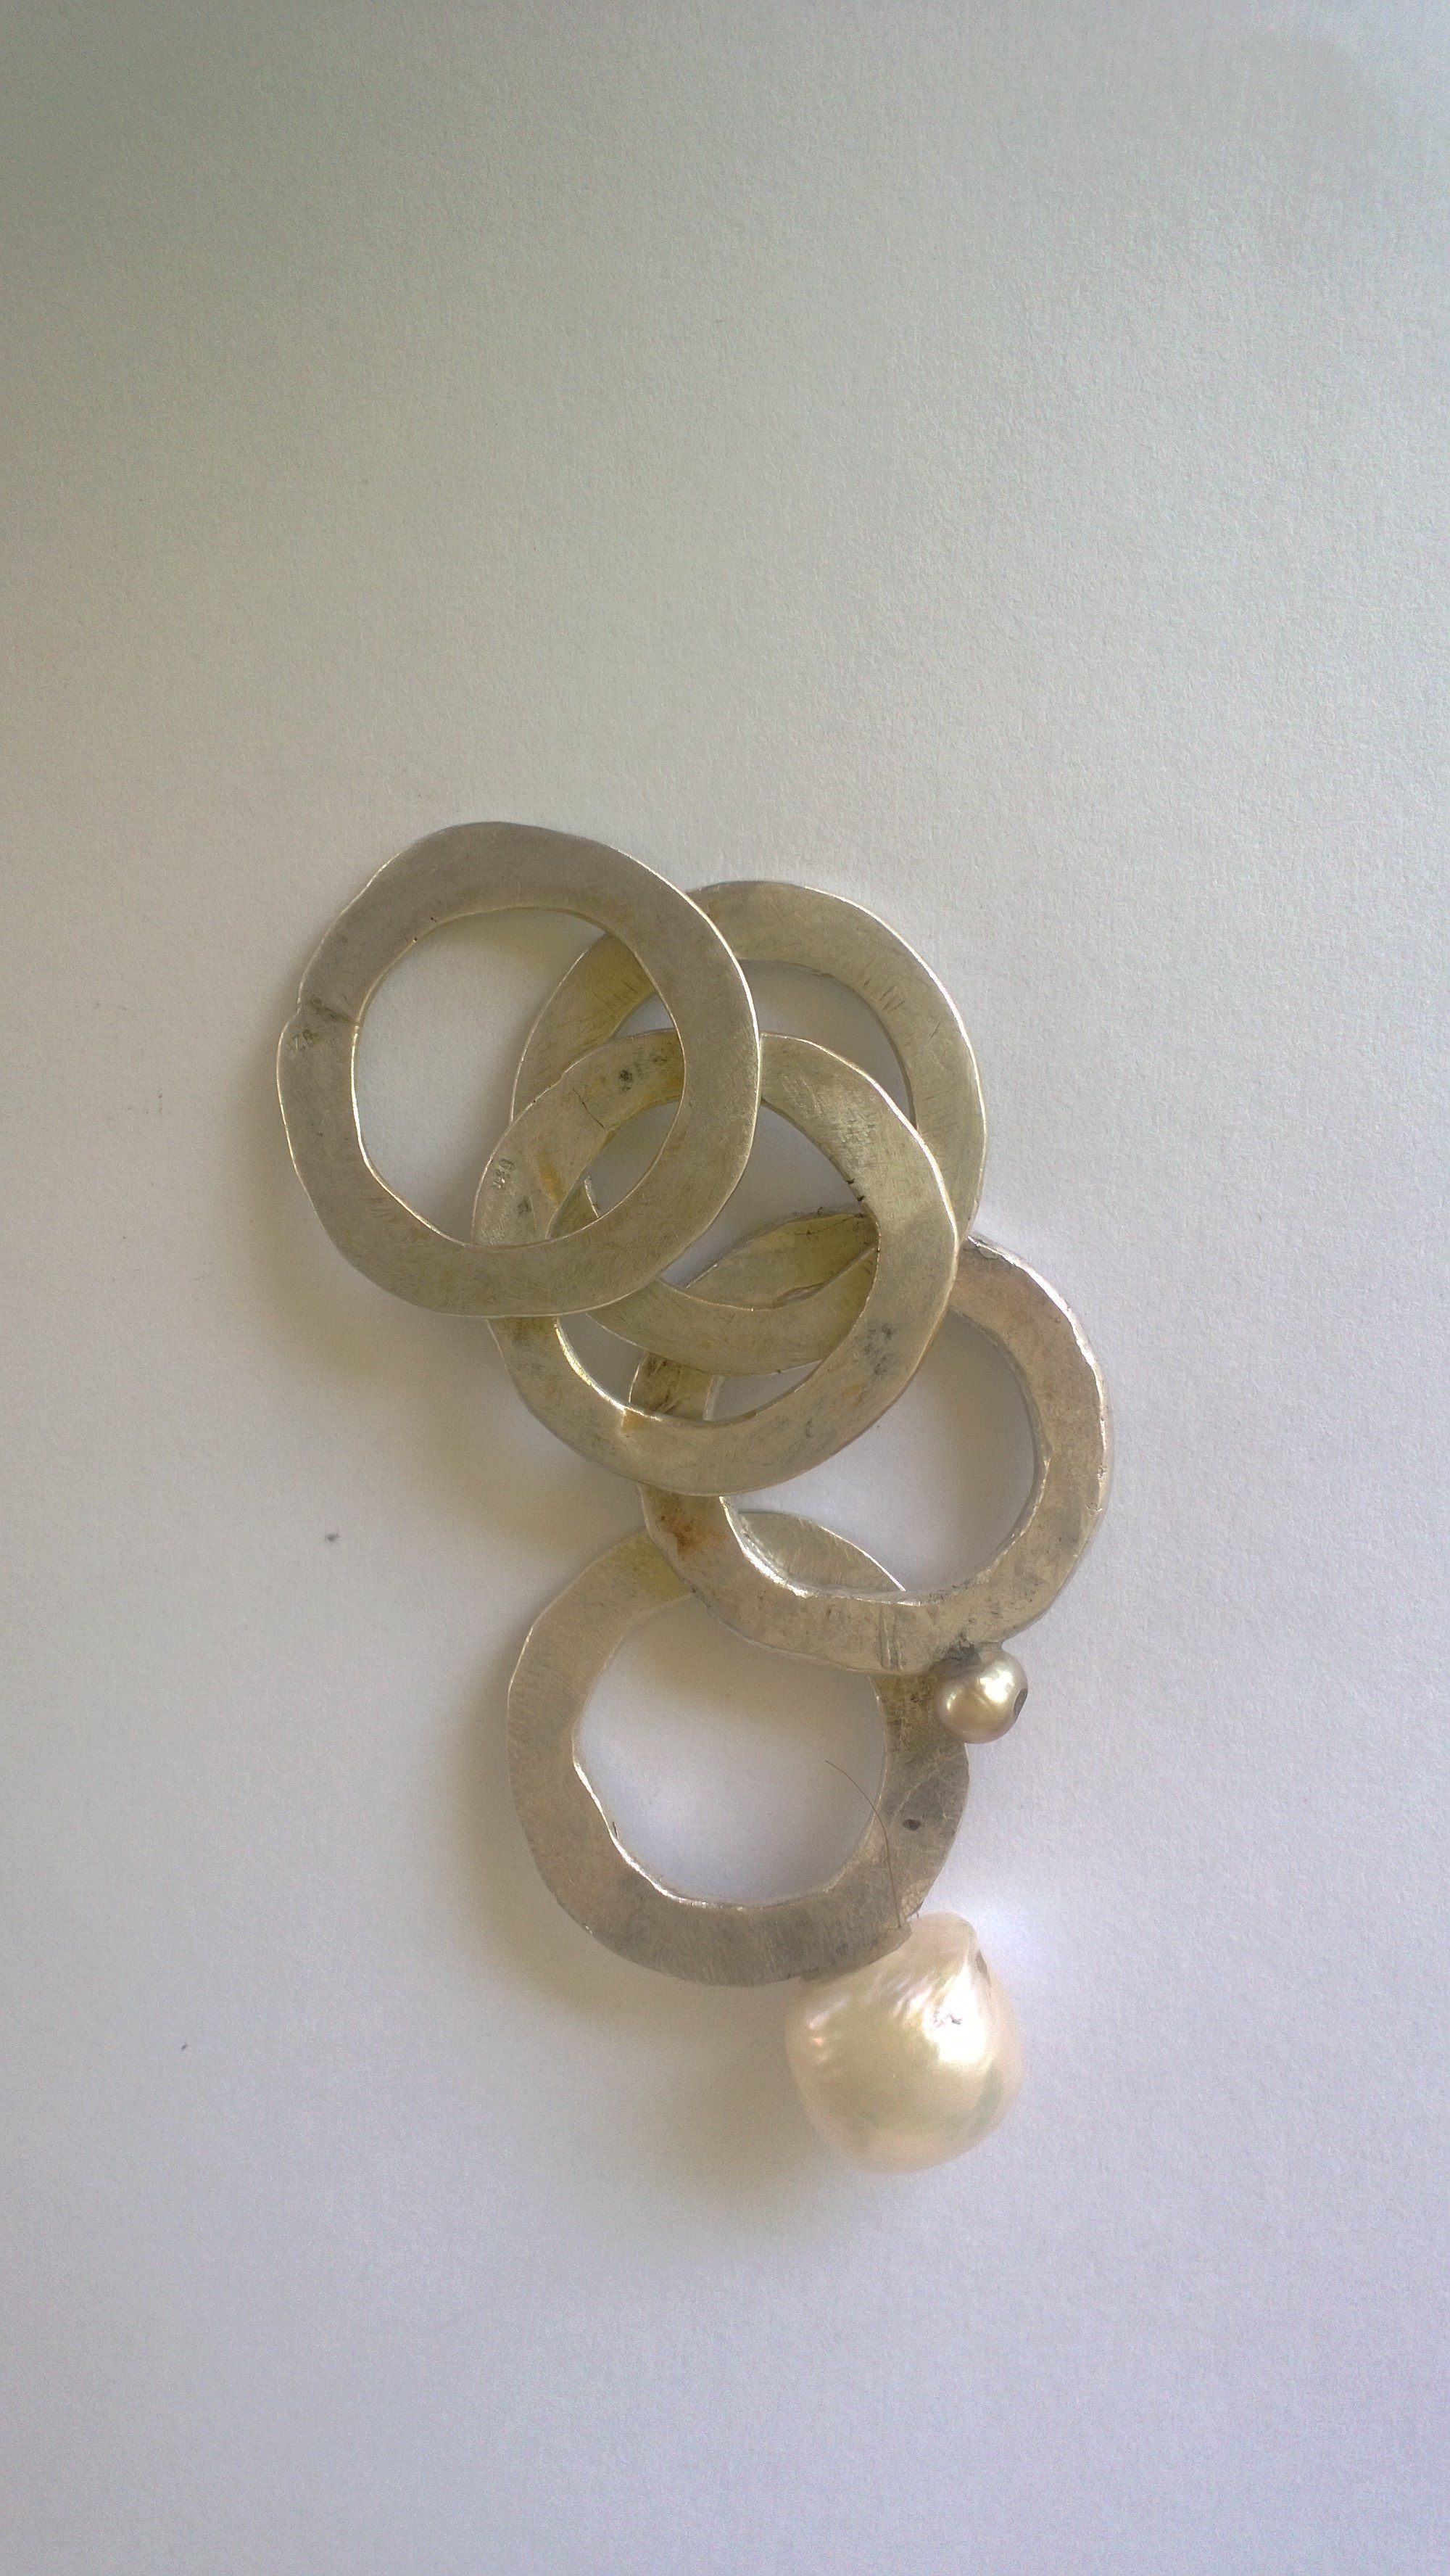 be6ca5b13640 Silver rings with pearls by Maria Vasiliou from Maria Vasiliou Kosmima..  Perlas